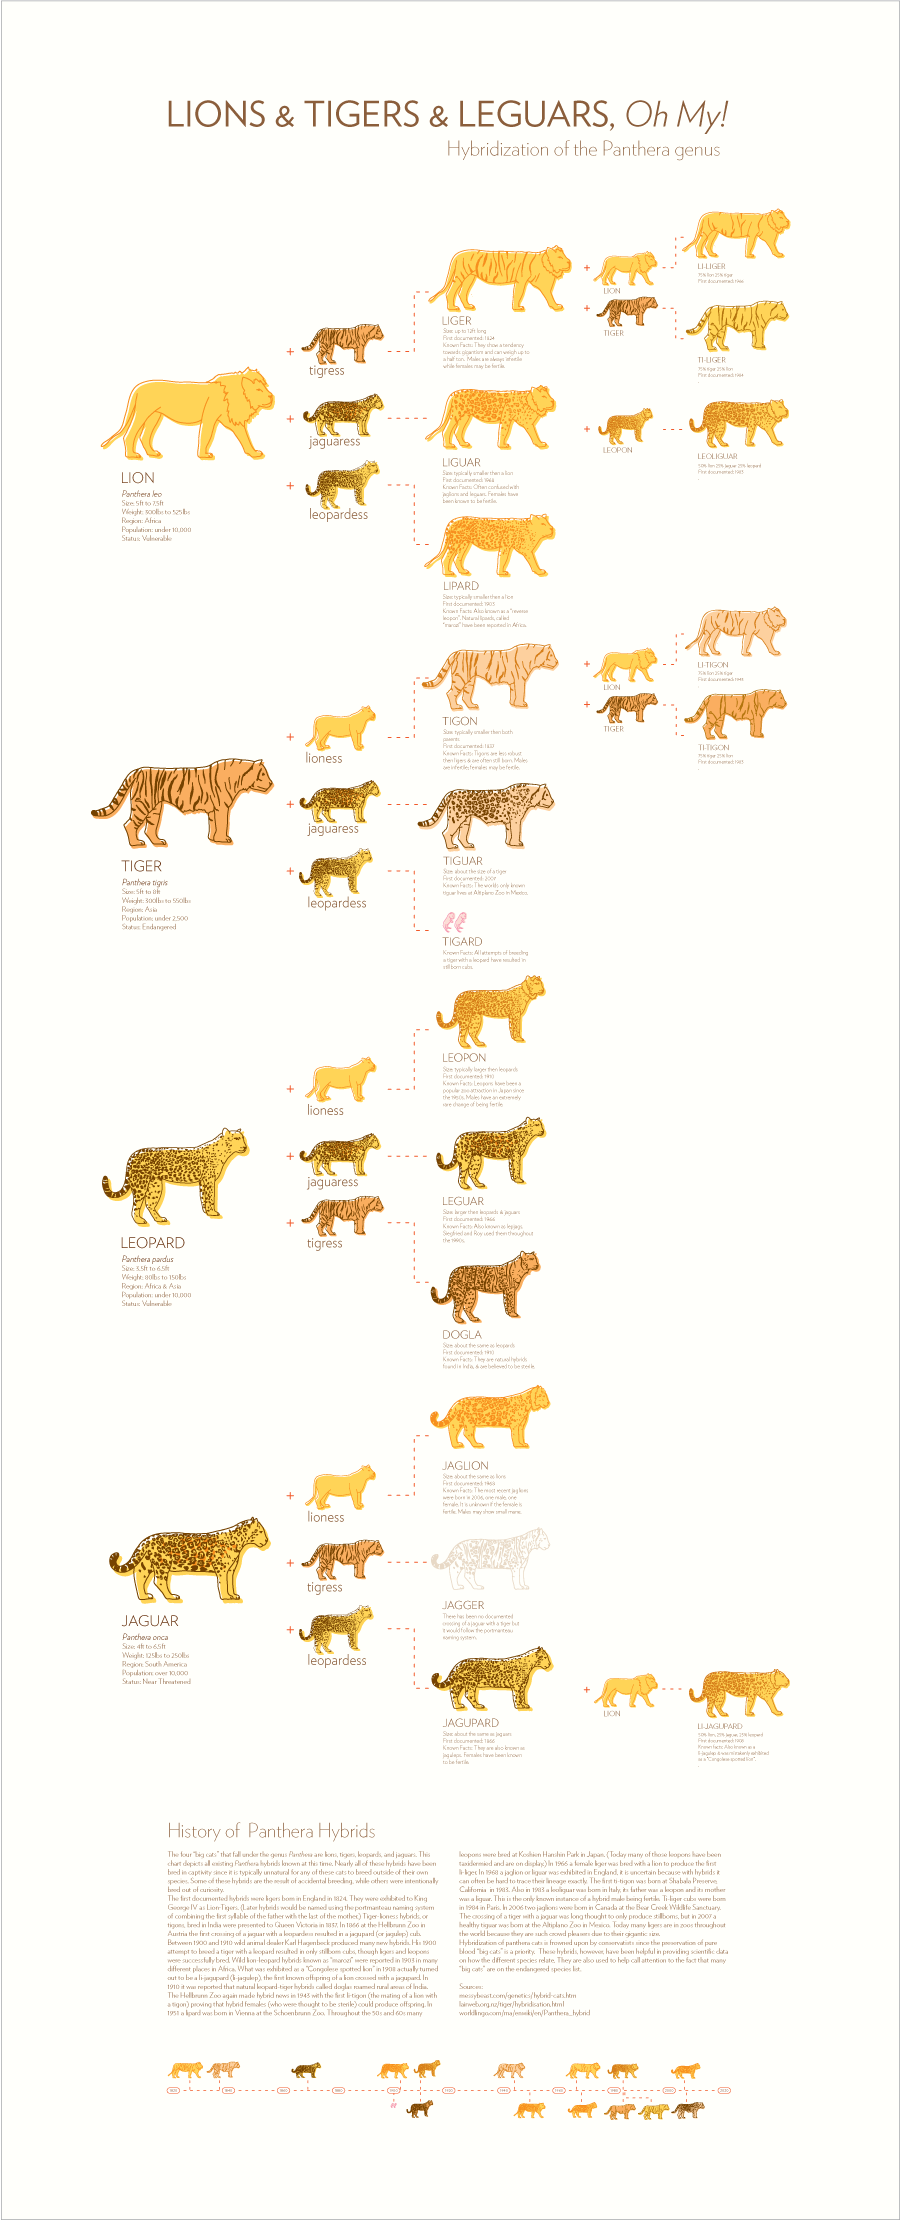 Lions amp Tigers amp Leguars Oh My amberlcox